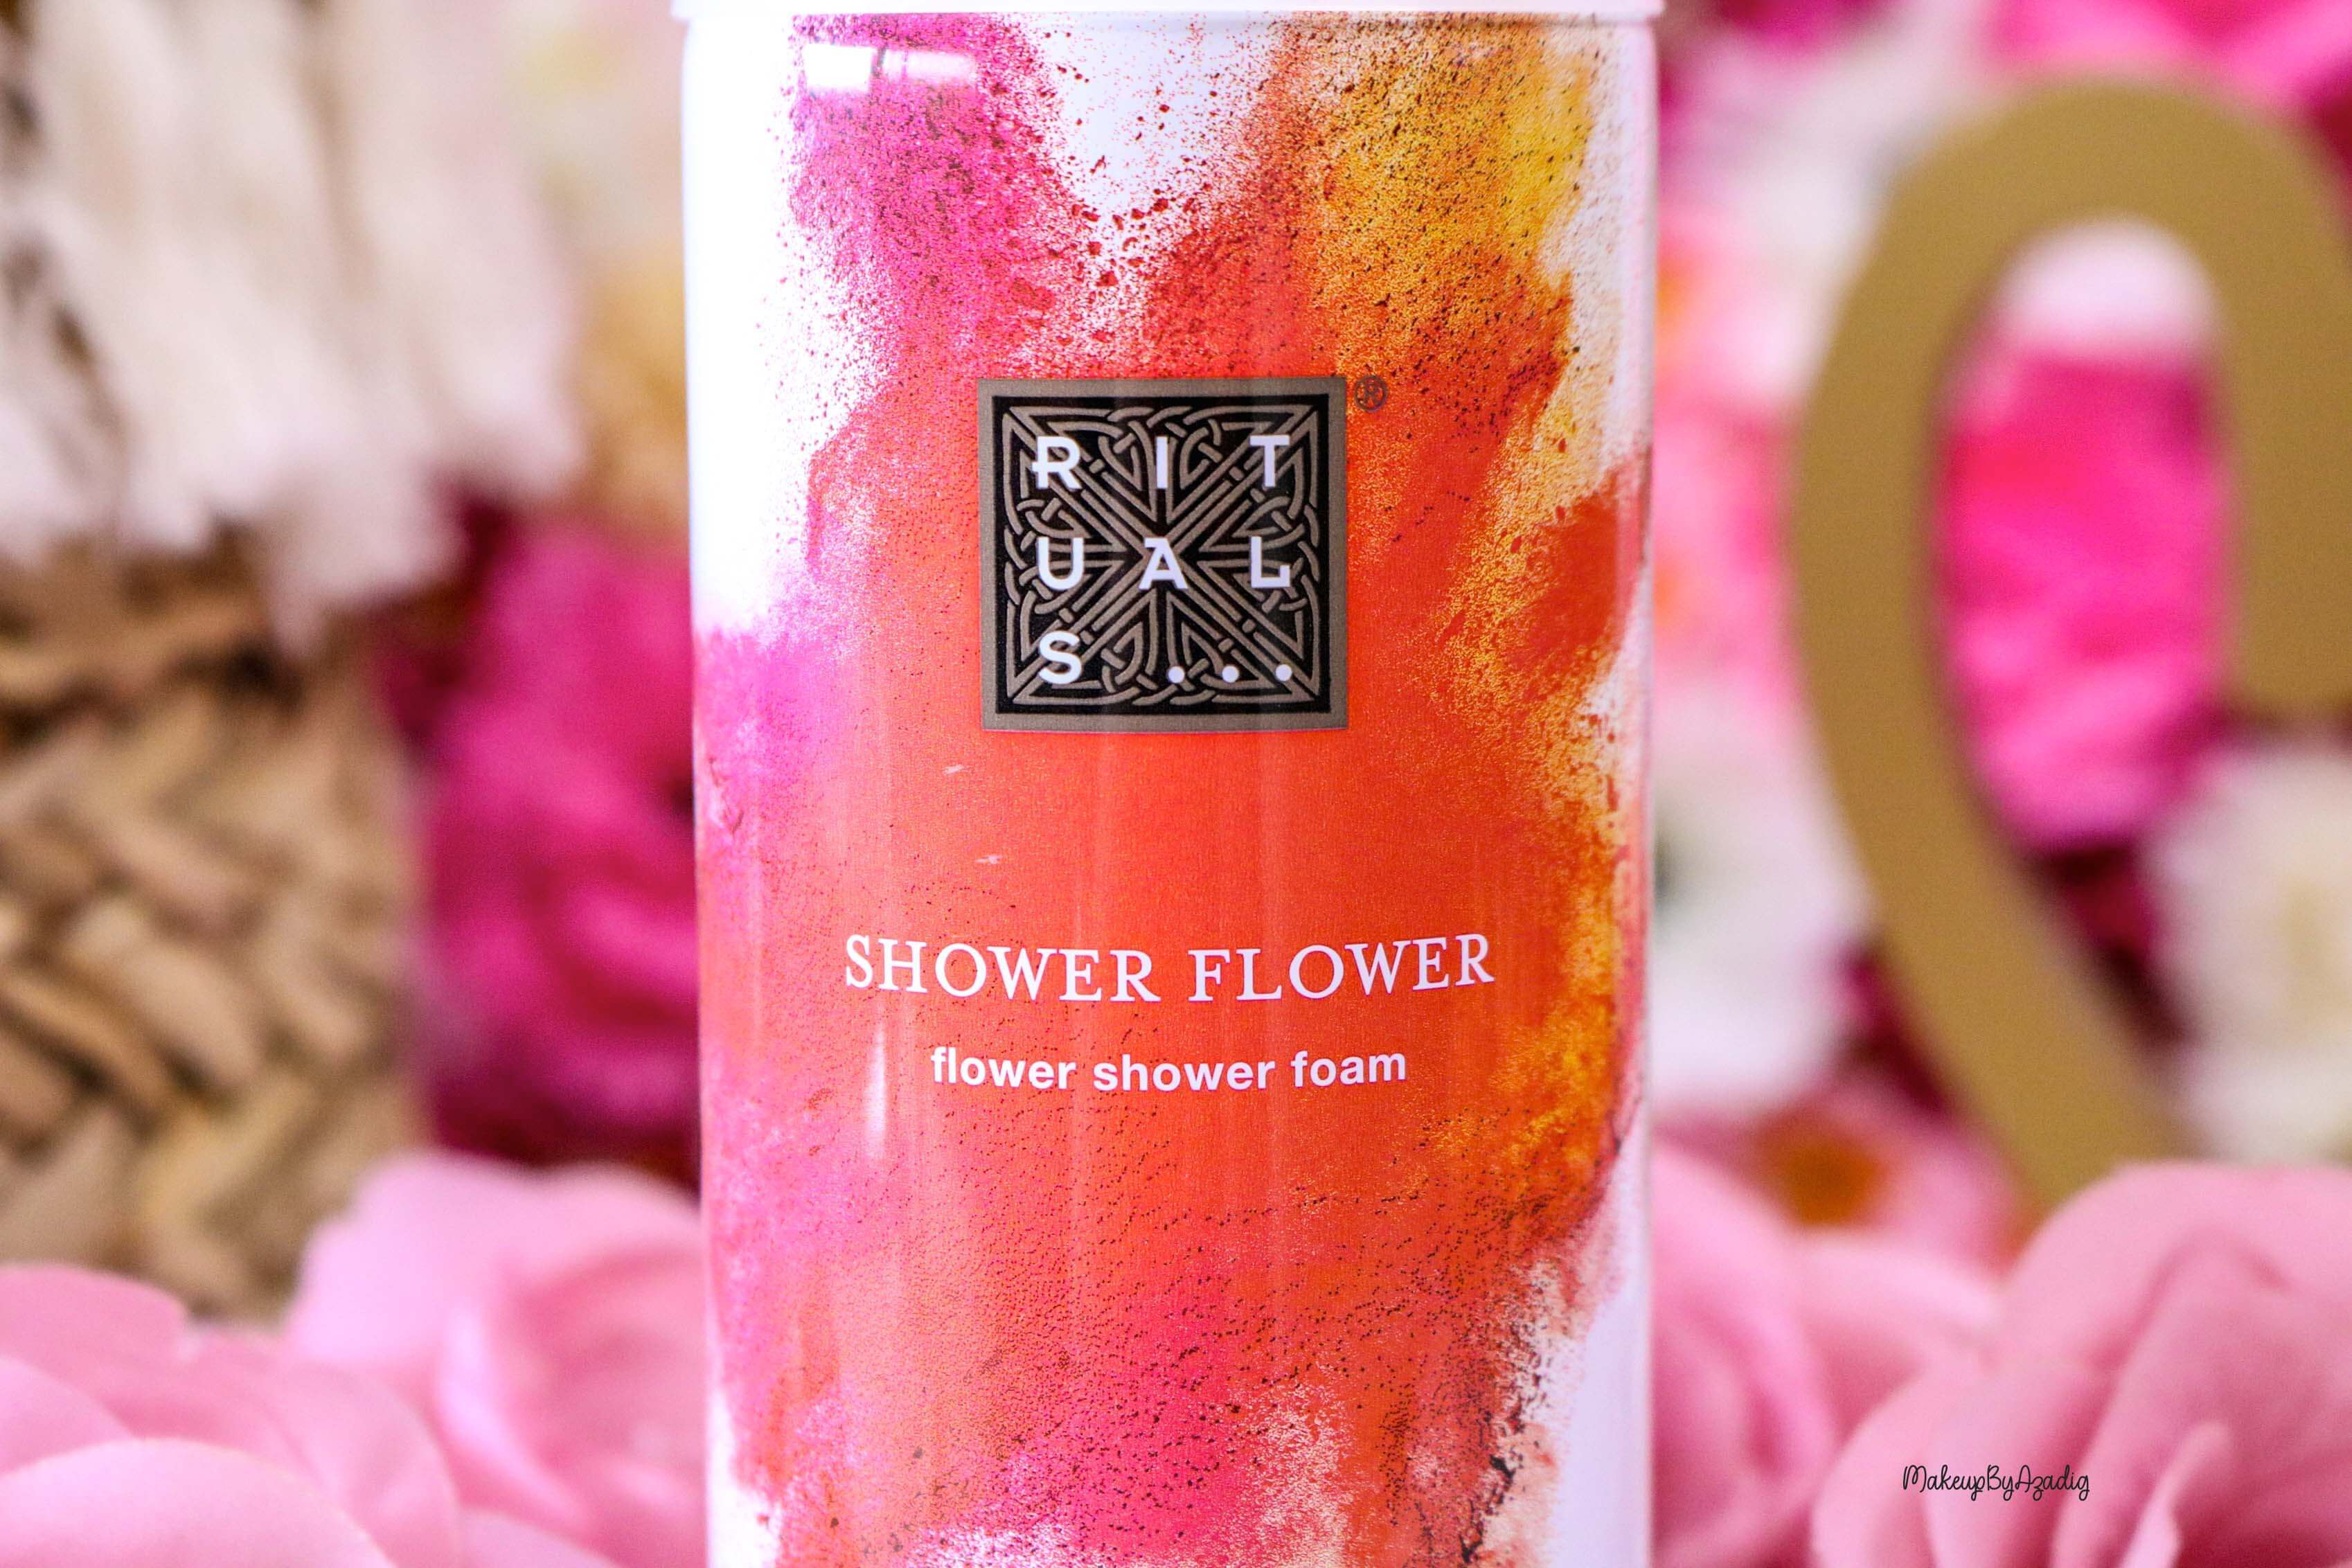 gel-douche-mousse-rituals-shower-flower-foam-ritual-hoi-makeupbyazadig-avis-prix-sephora-france-zoom